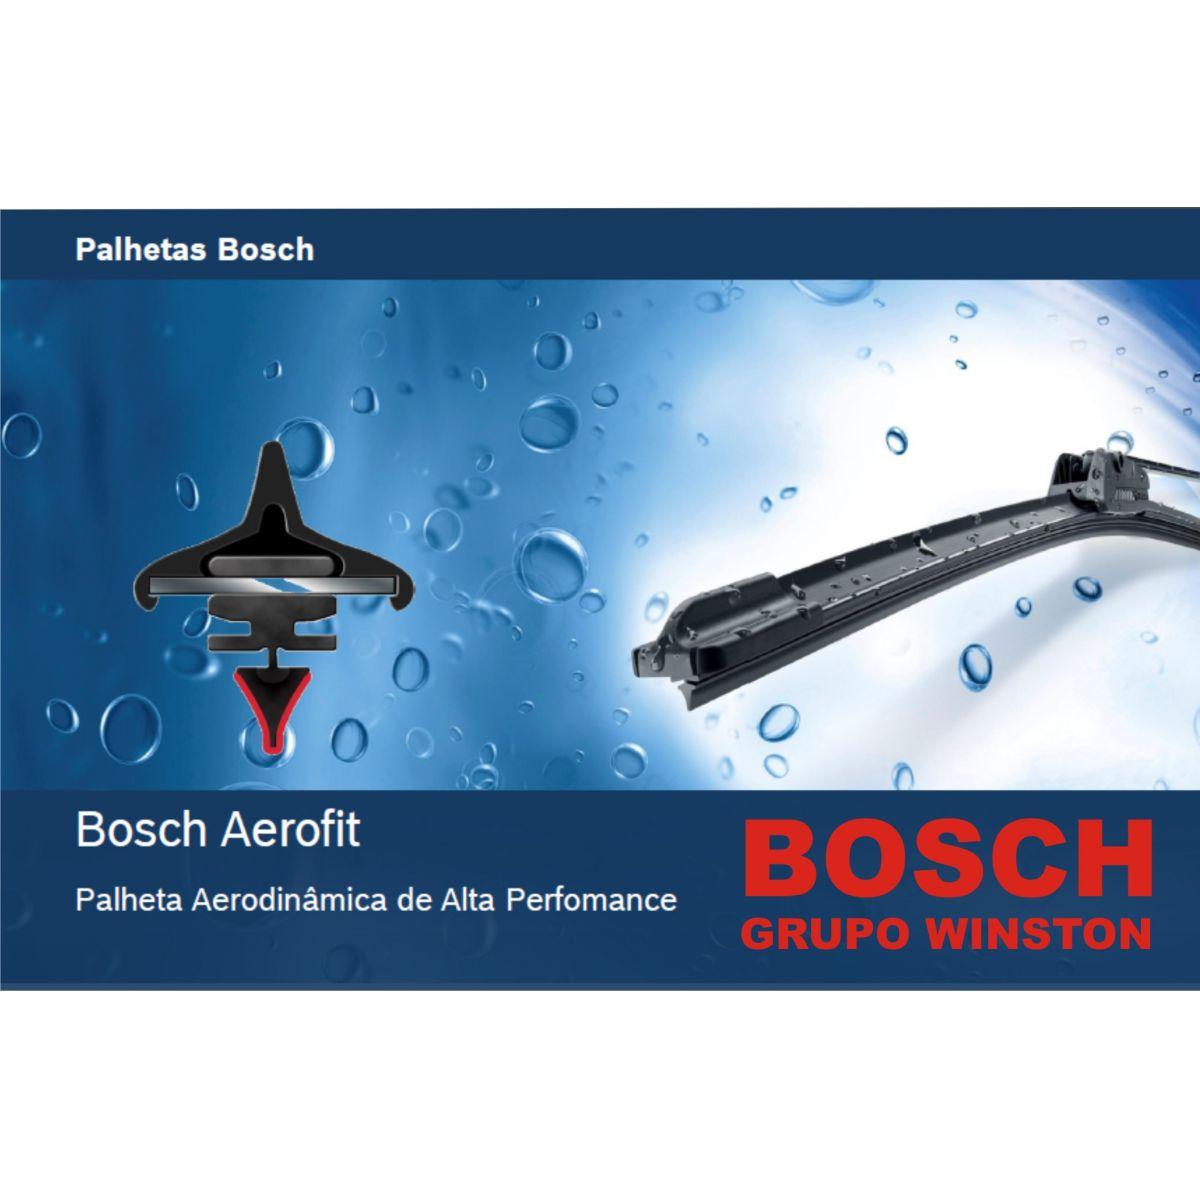 Palheta Bosch Aerofit Limpador de para brisa Bosch Sentra II